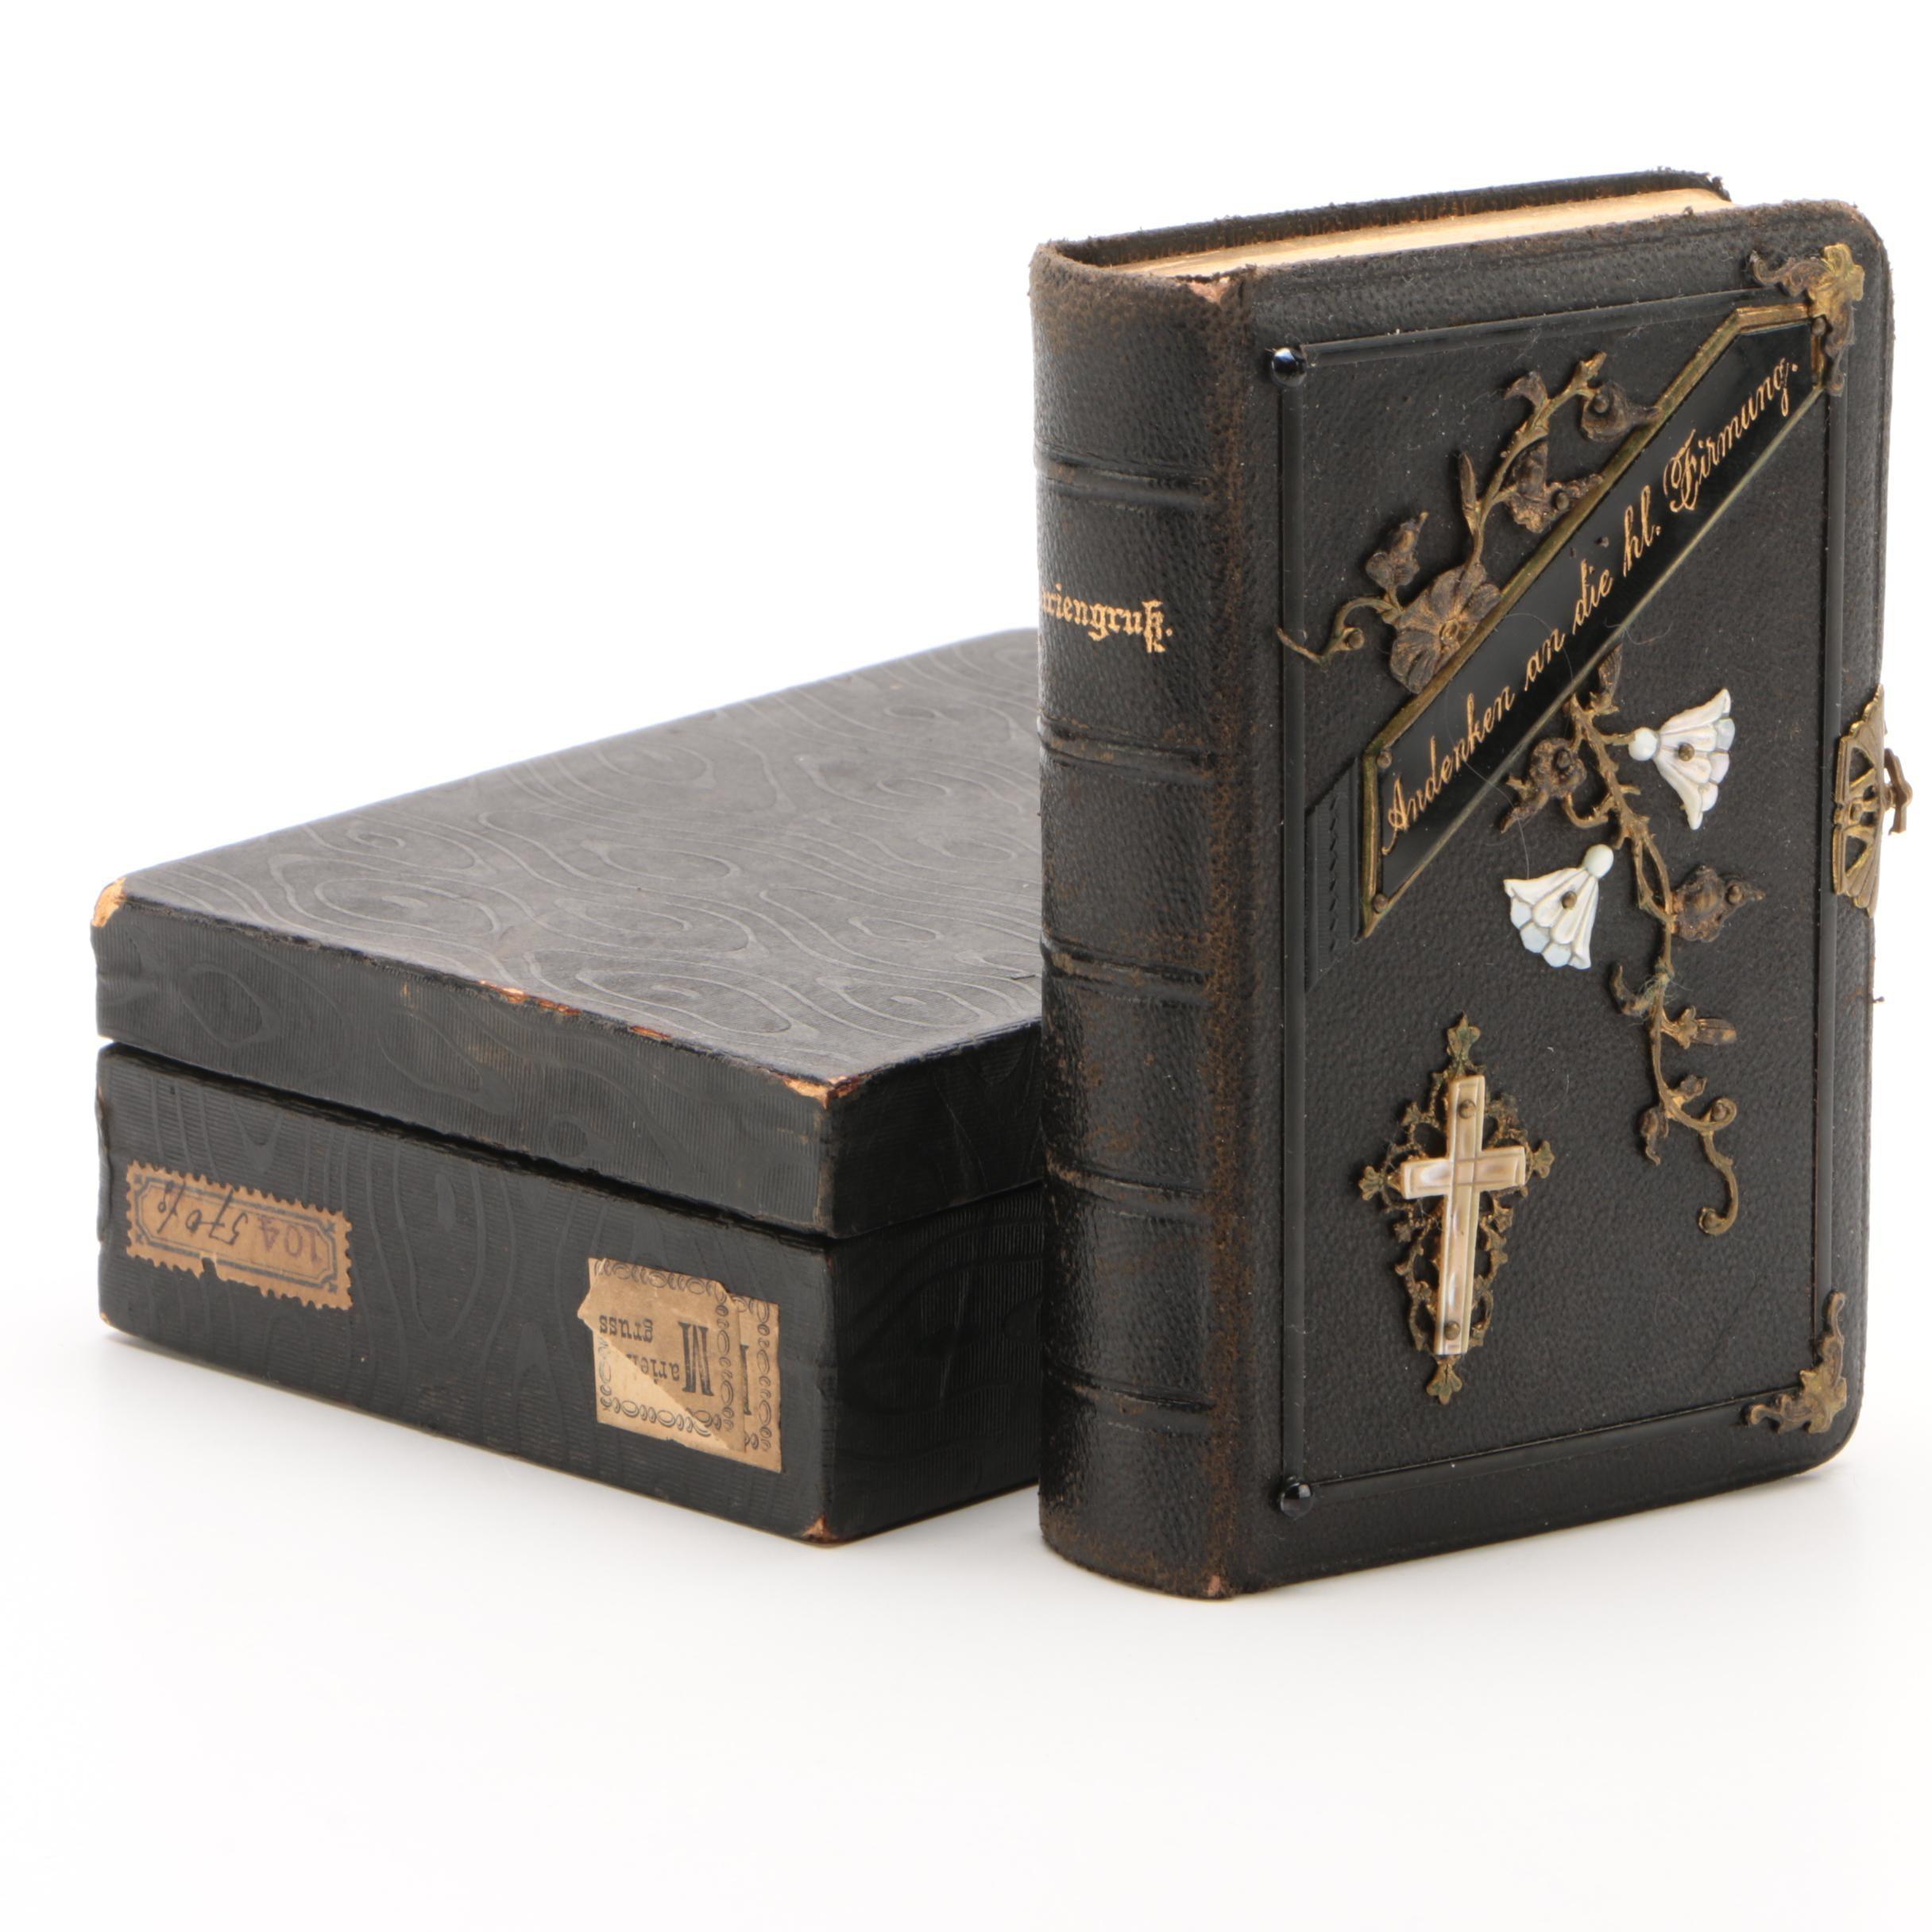 "German-Language ""Mariengruk"" Leather Bound Prayer Book, 1897"